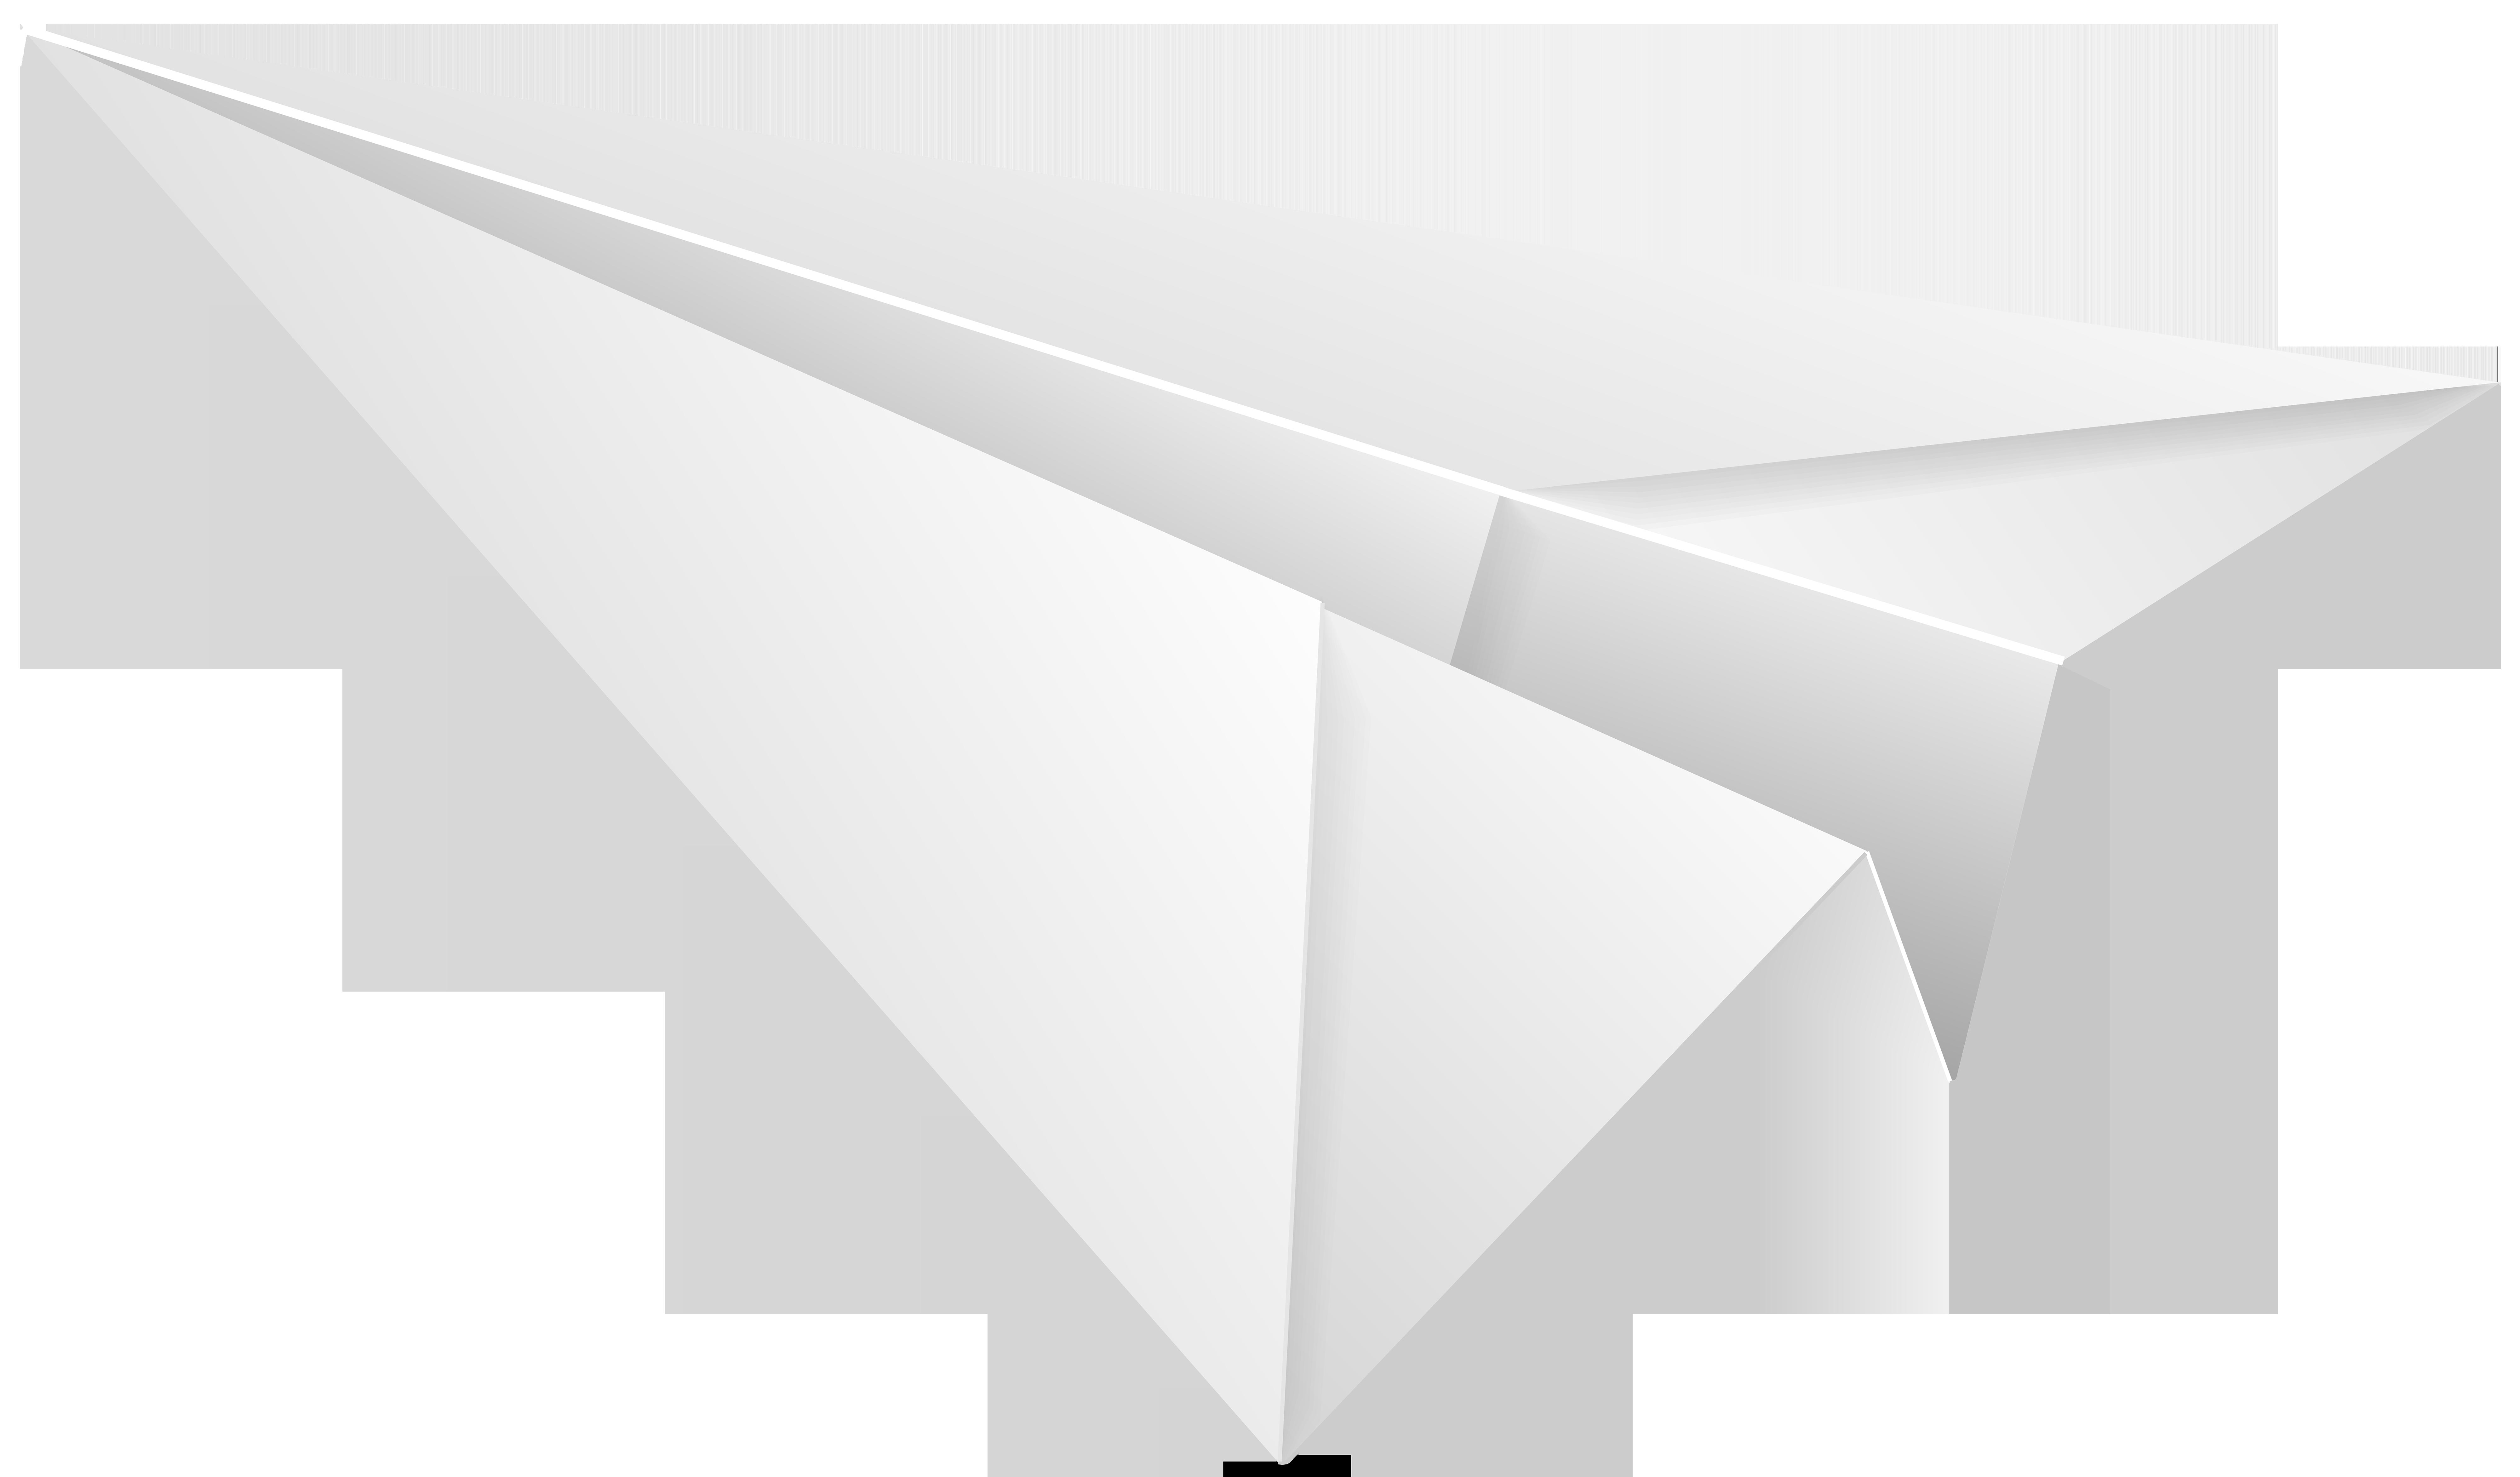 Plane png clip art. Clipart road paper